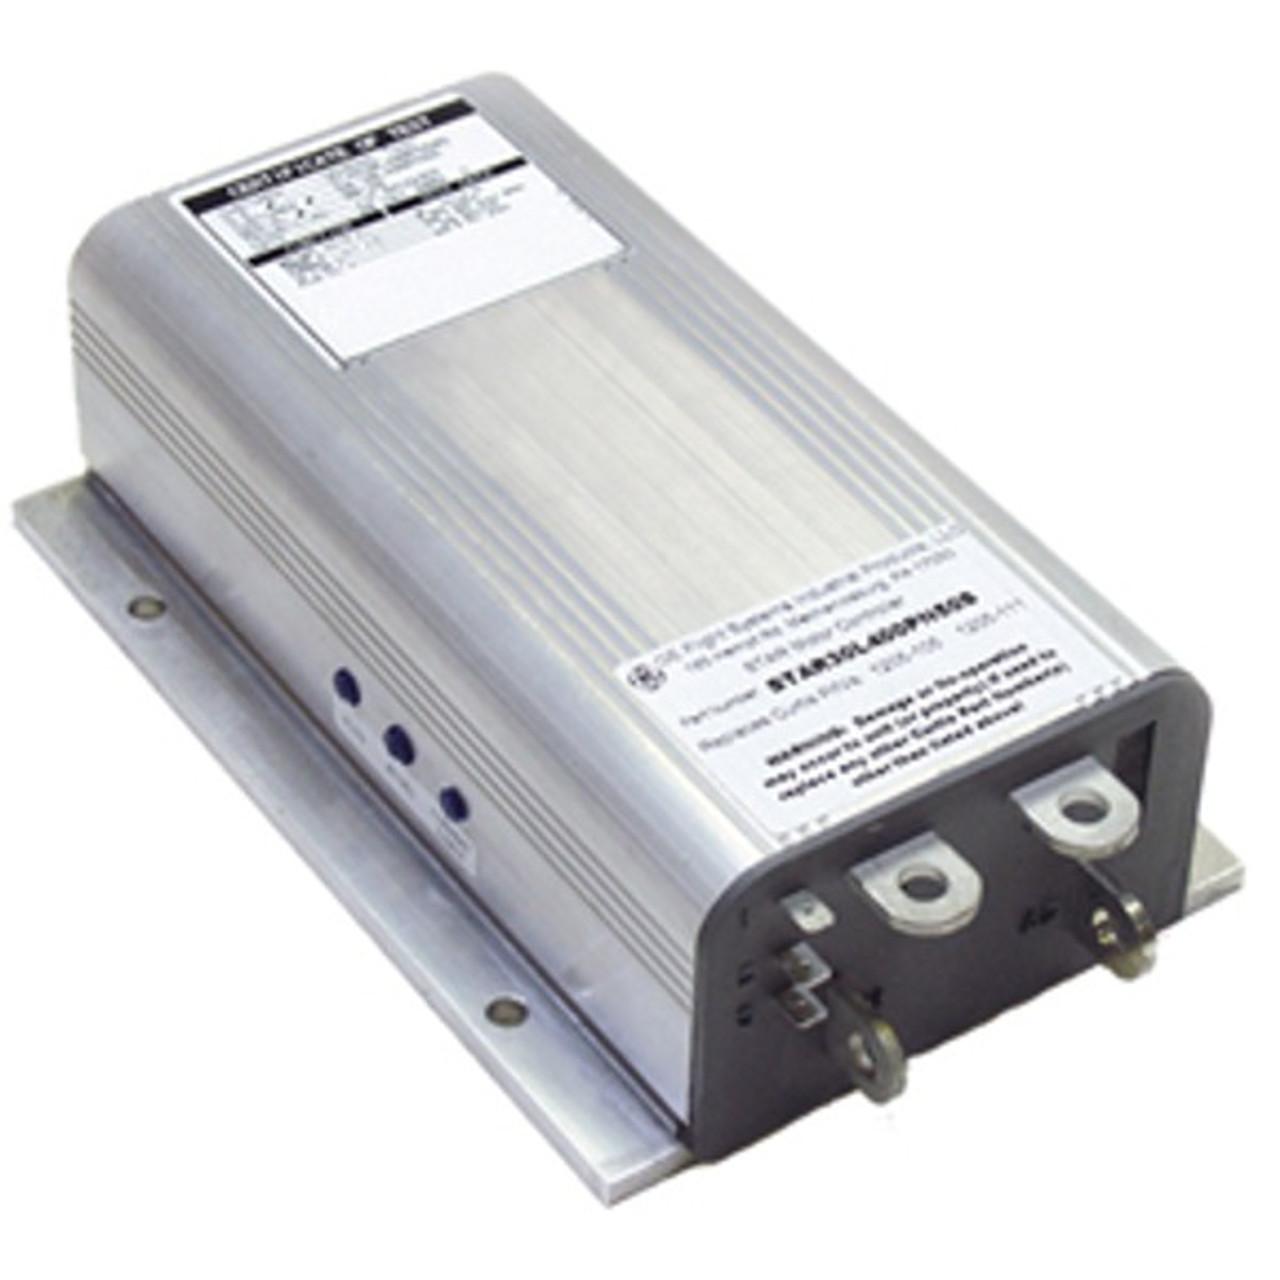 FSIP 500AMP Controller for EZ-GO, Club Car Resistor Based Carts 0-5K